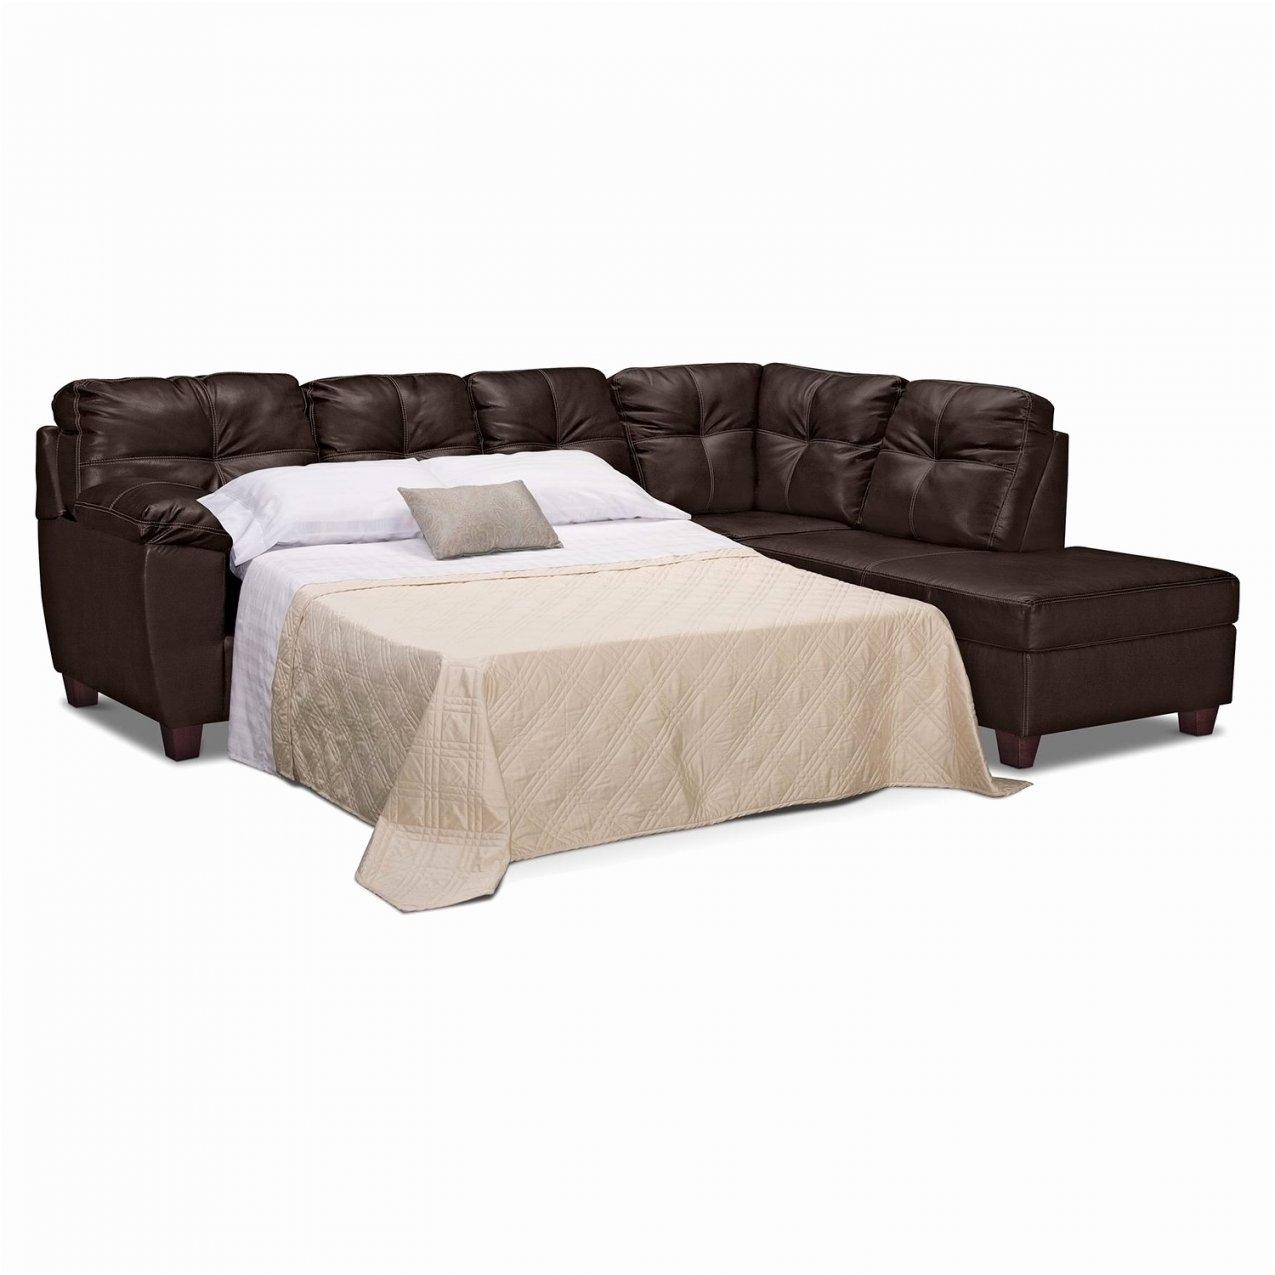 Sleeper Sofa Ikea Sectional Sofa Bed Fabric Sectional With Leather Inside Ikea Sectional Sleeper Sofas (View 8 of 10)